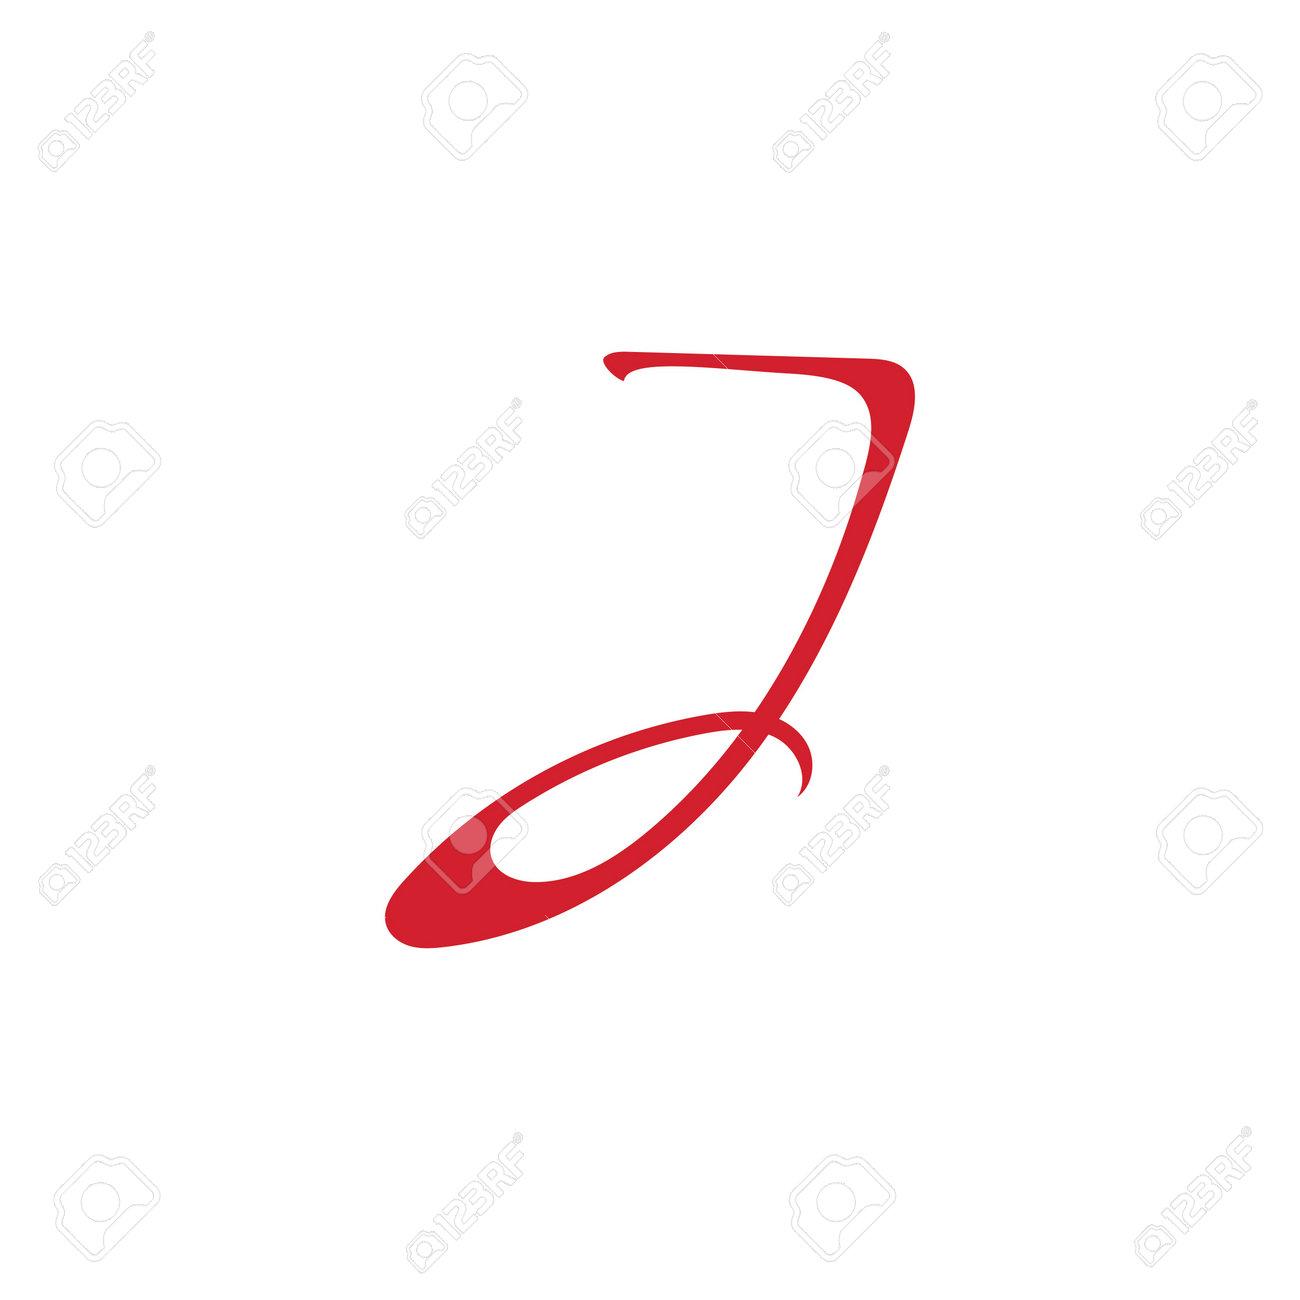 Letter J Template vector icon design - 166652552